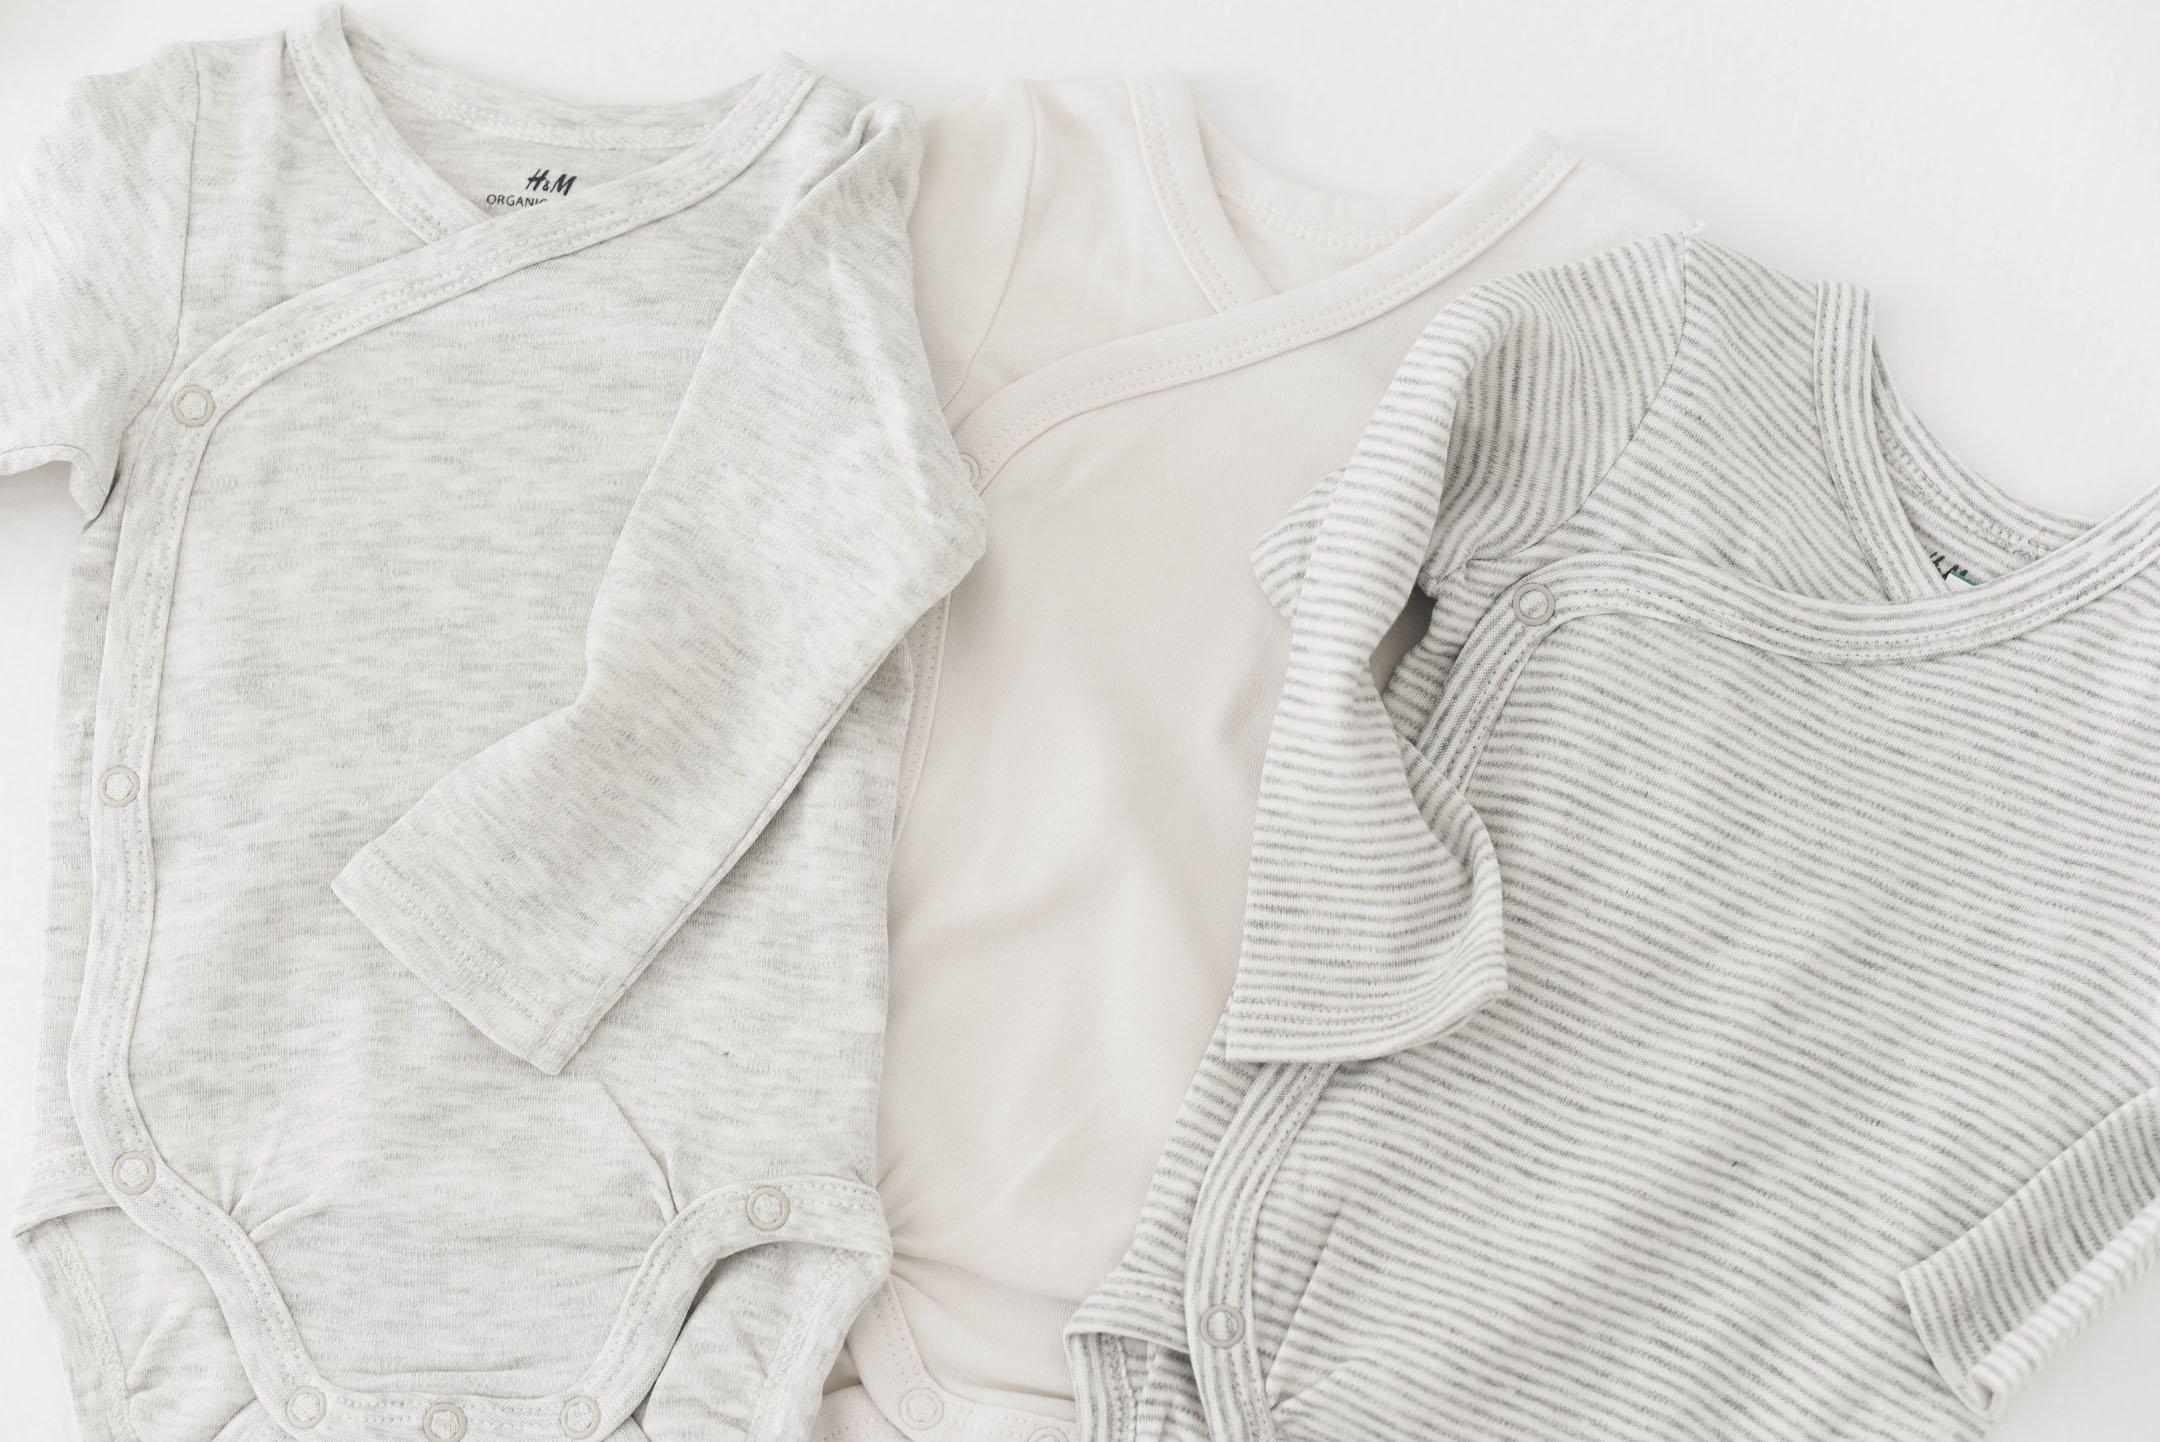 H&M kimono onesies